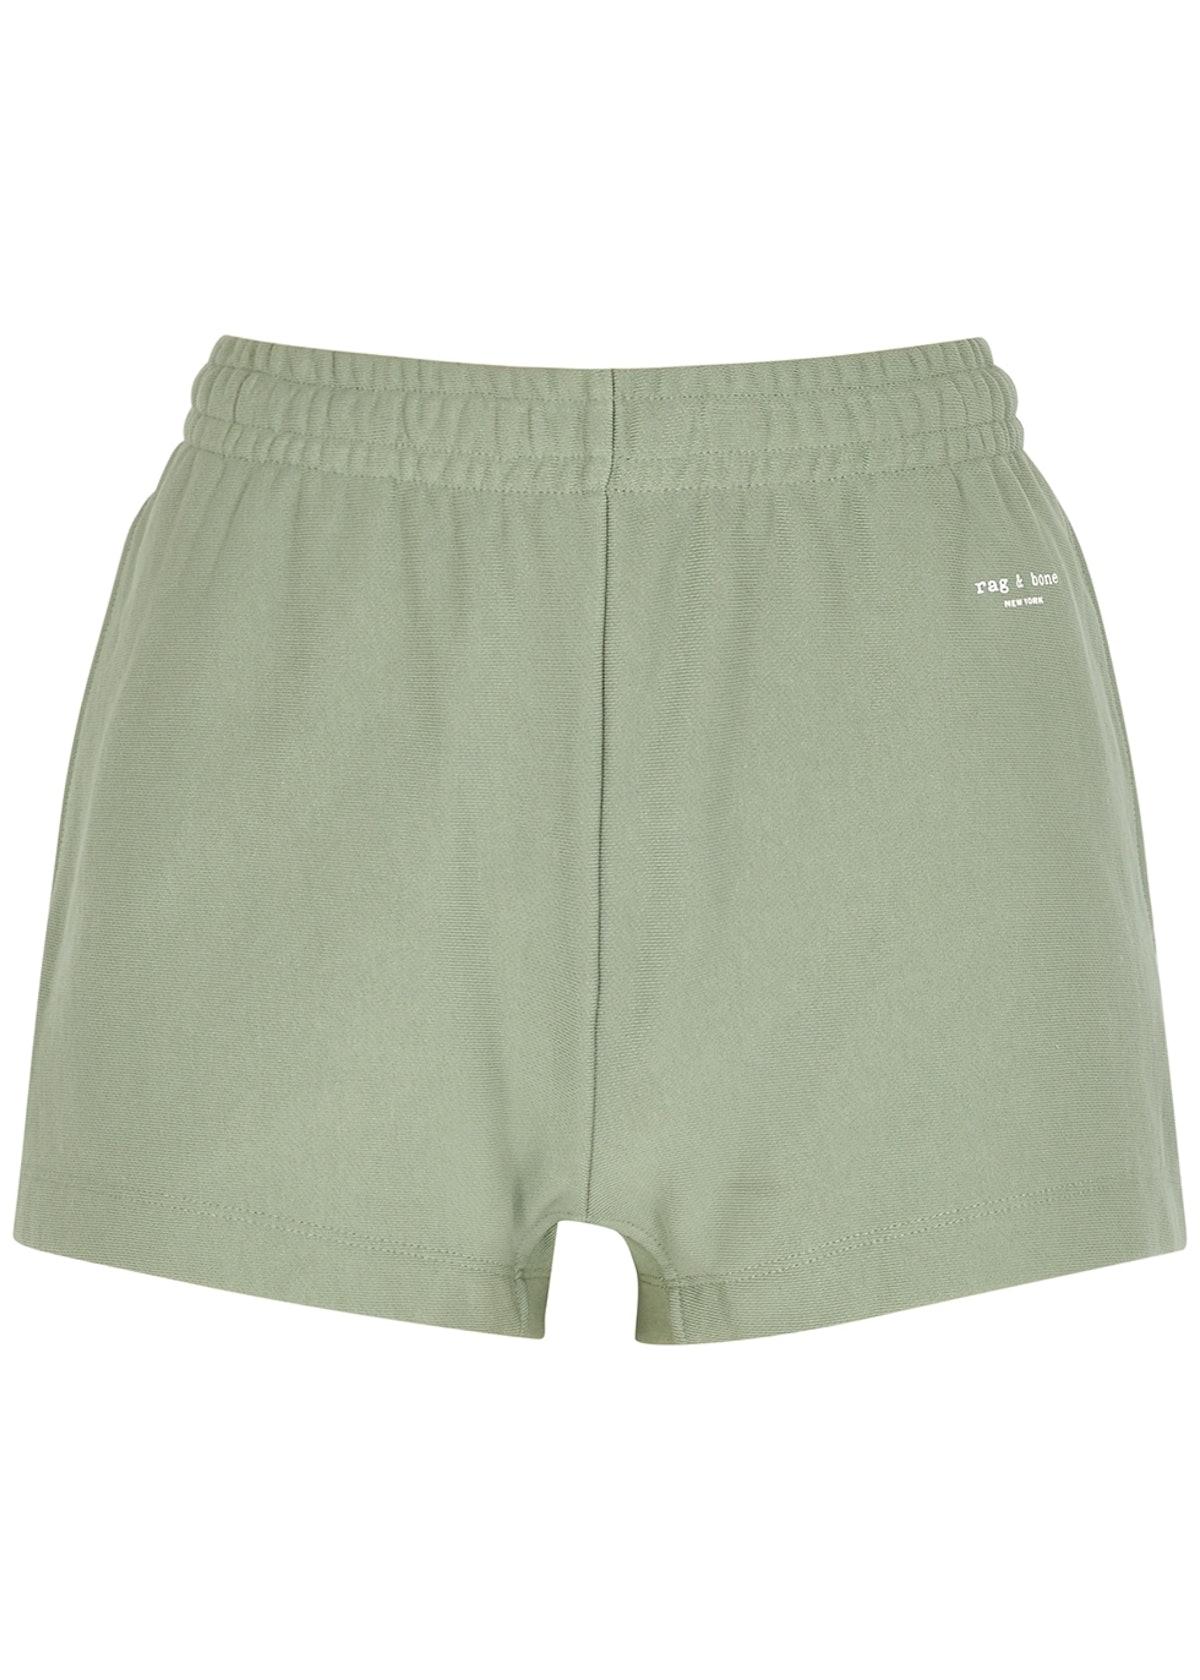 City sage jersey shorts: image 1